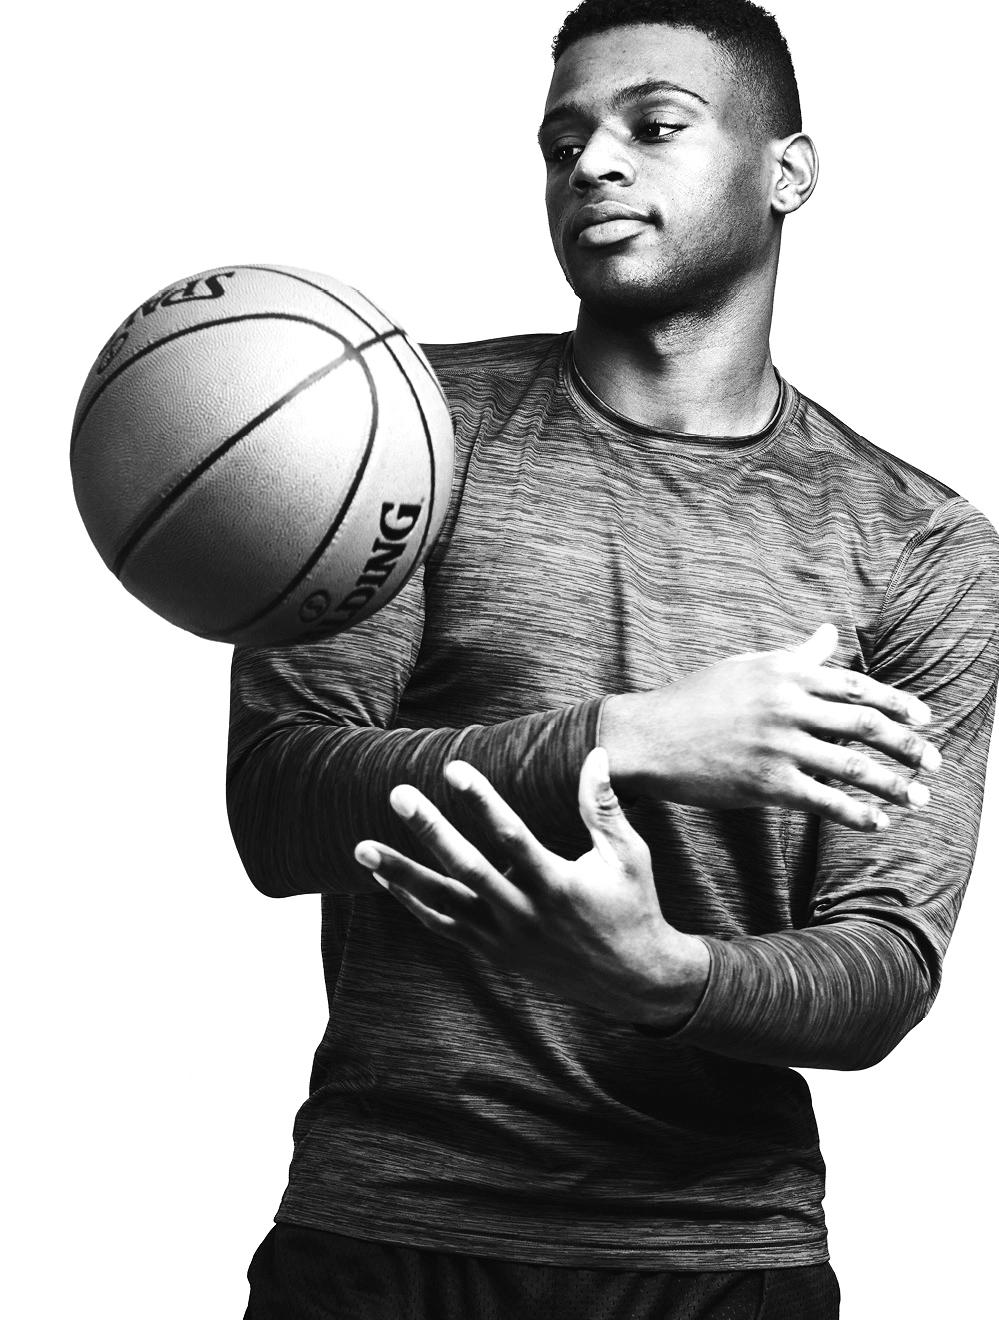 Everett_Aaron_Okayama_Basketball1.jpg